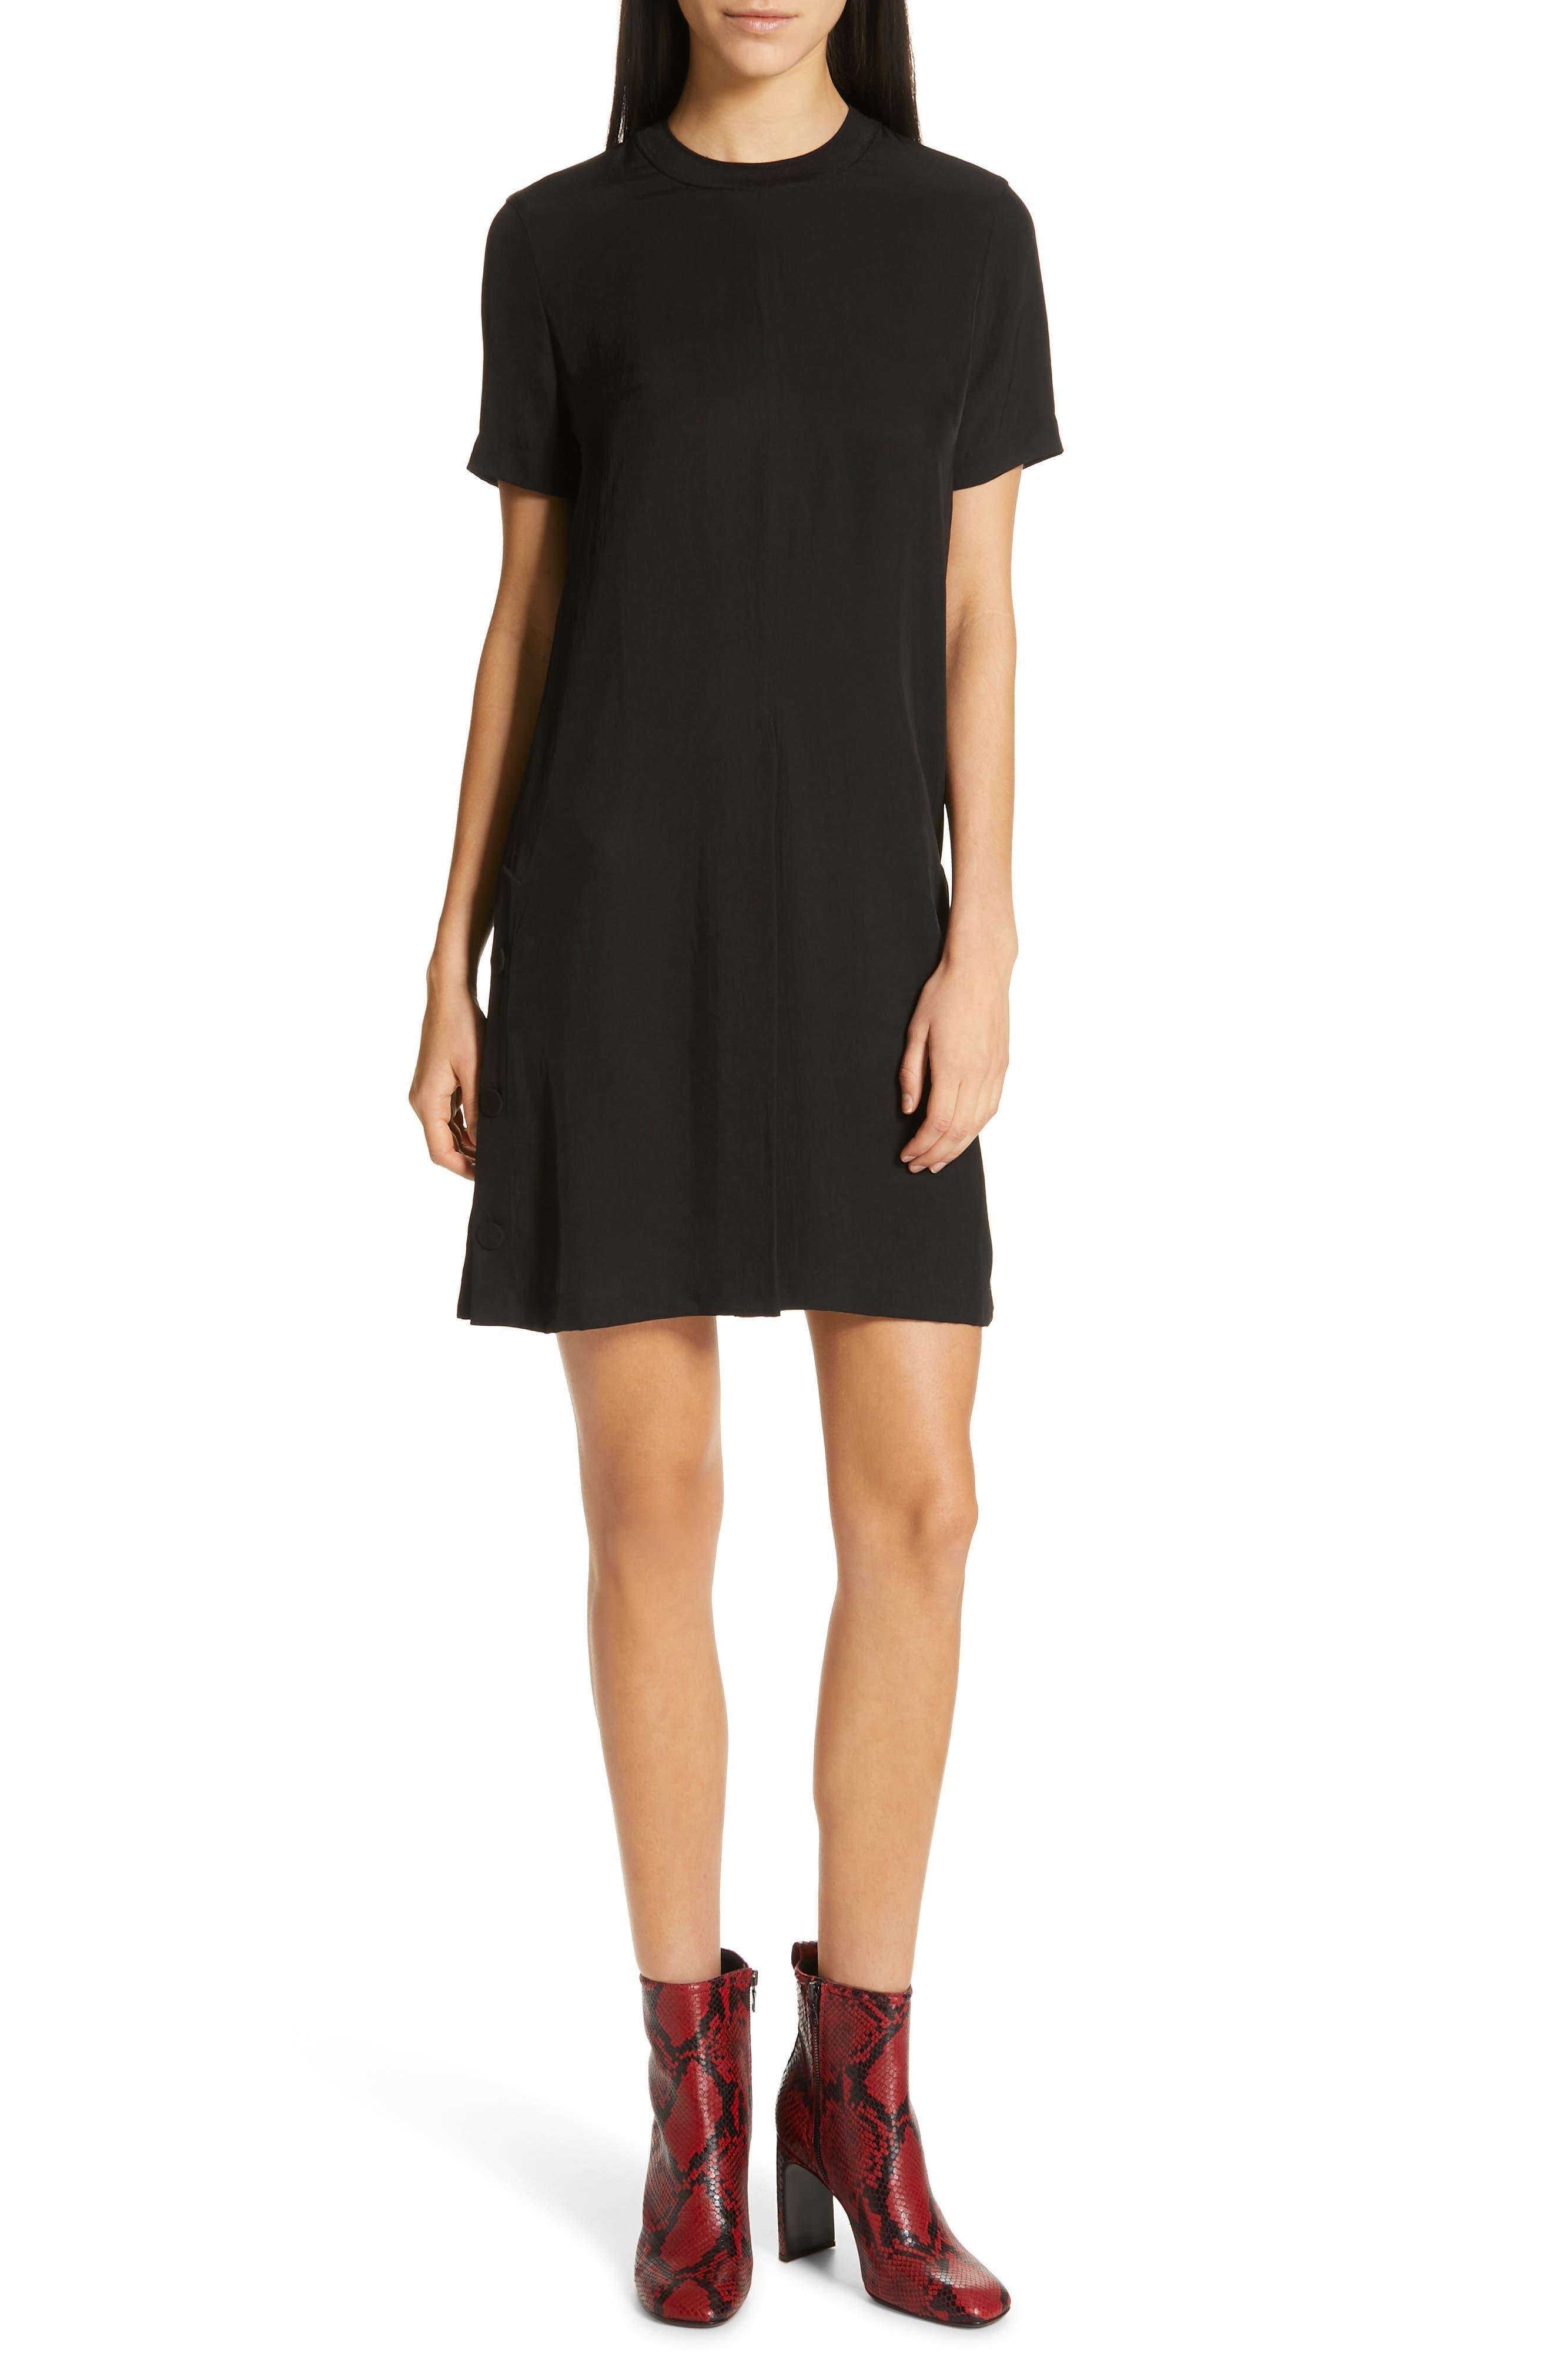 RAG & BONE Aiden T-Shirt Dress, Main, color, BLACK